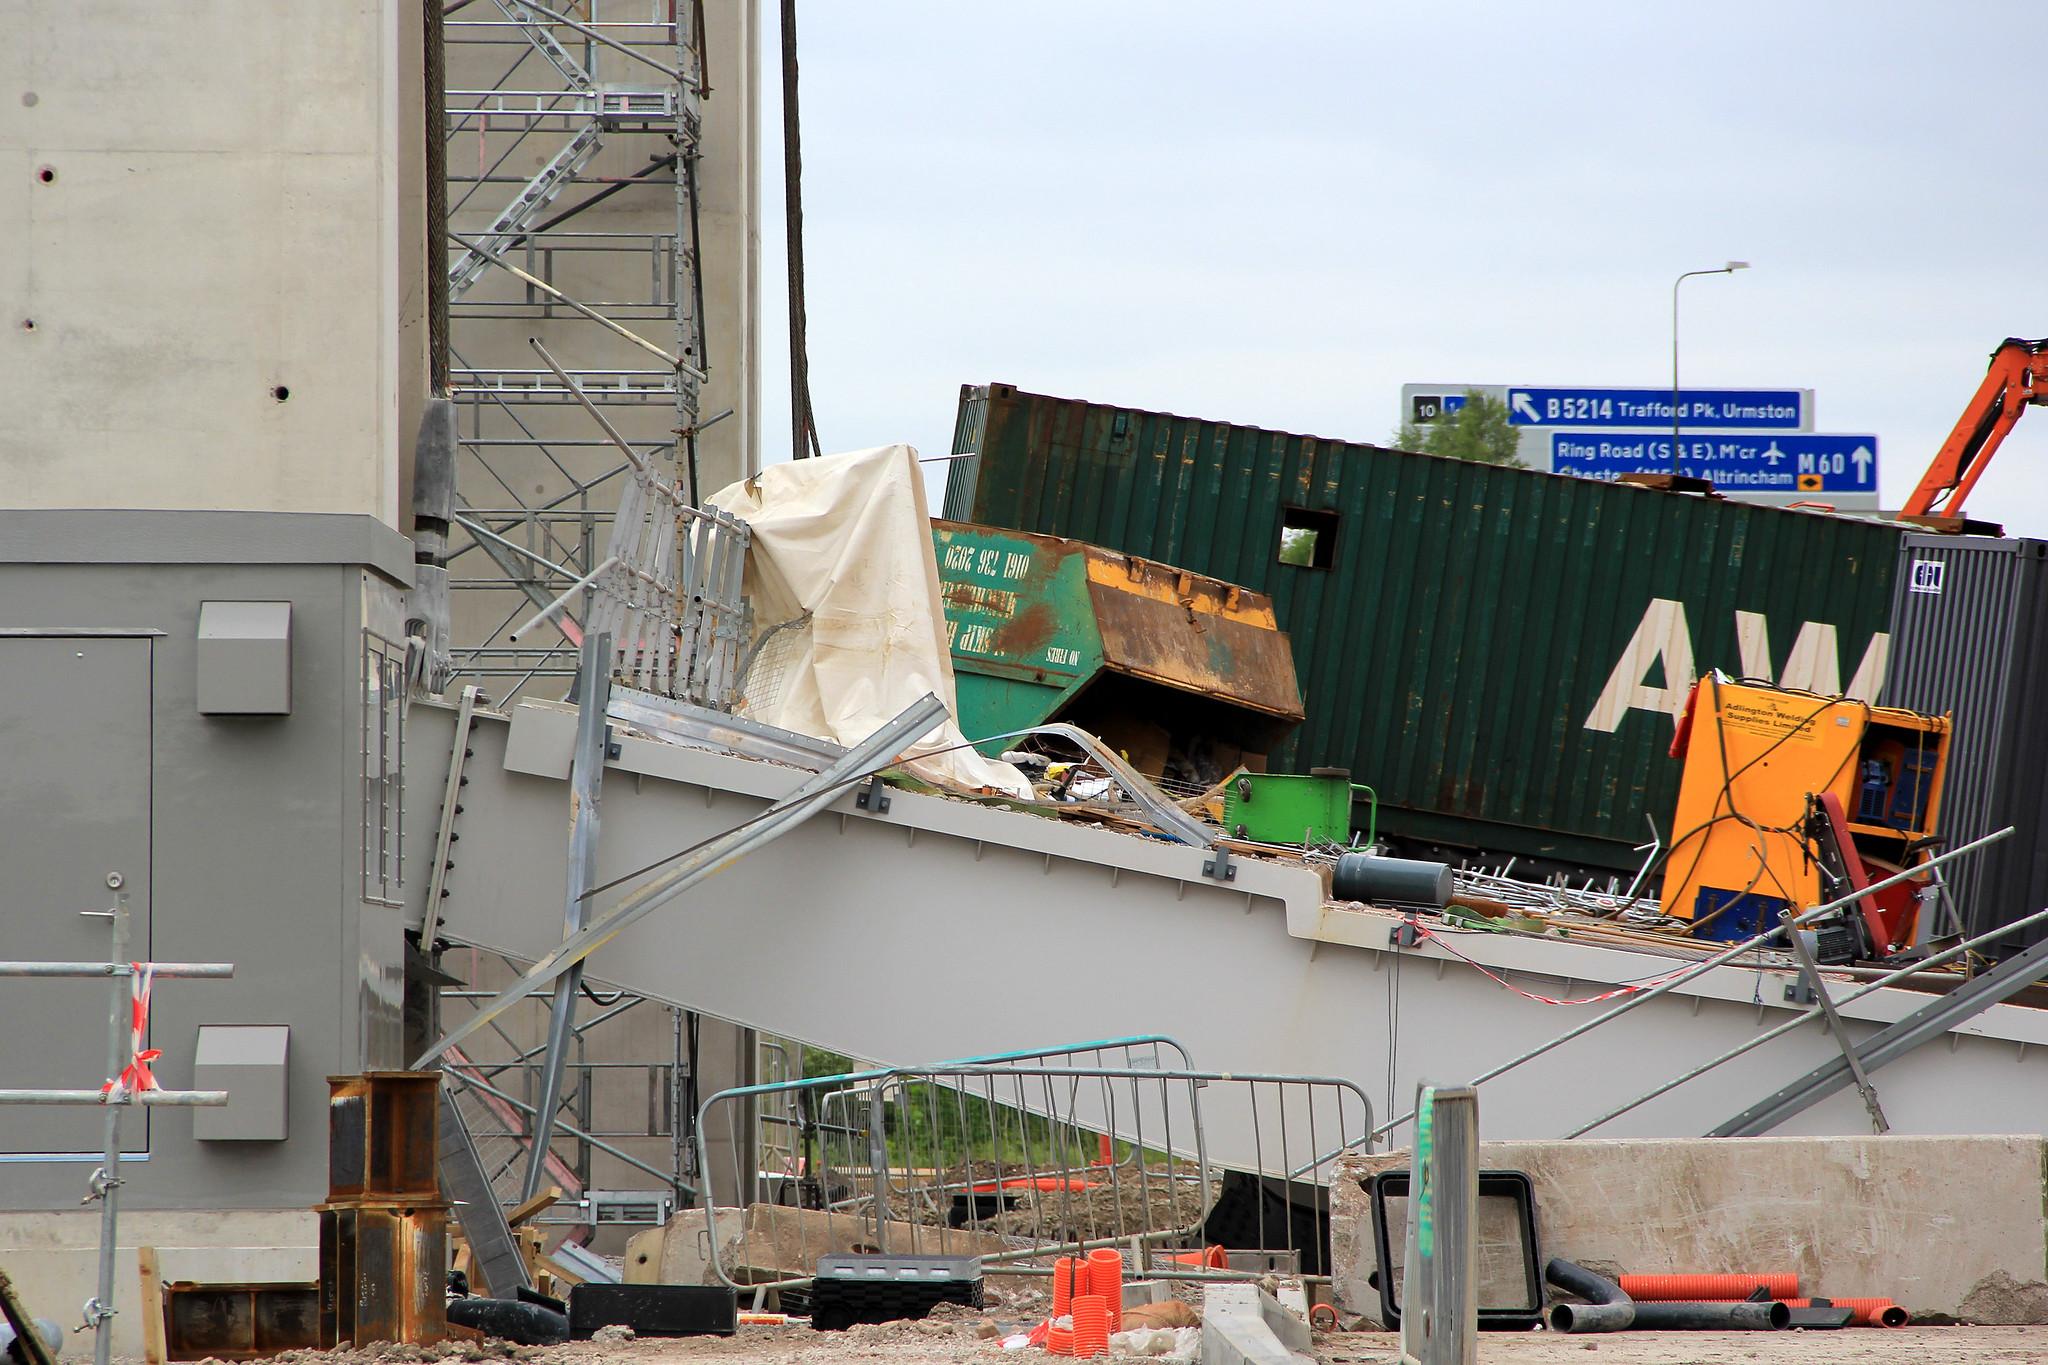 Lift bridge collapse